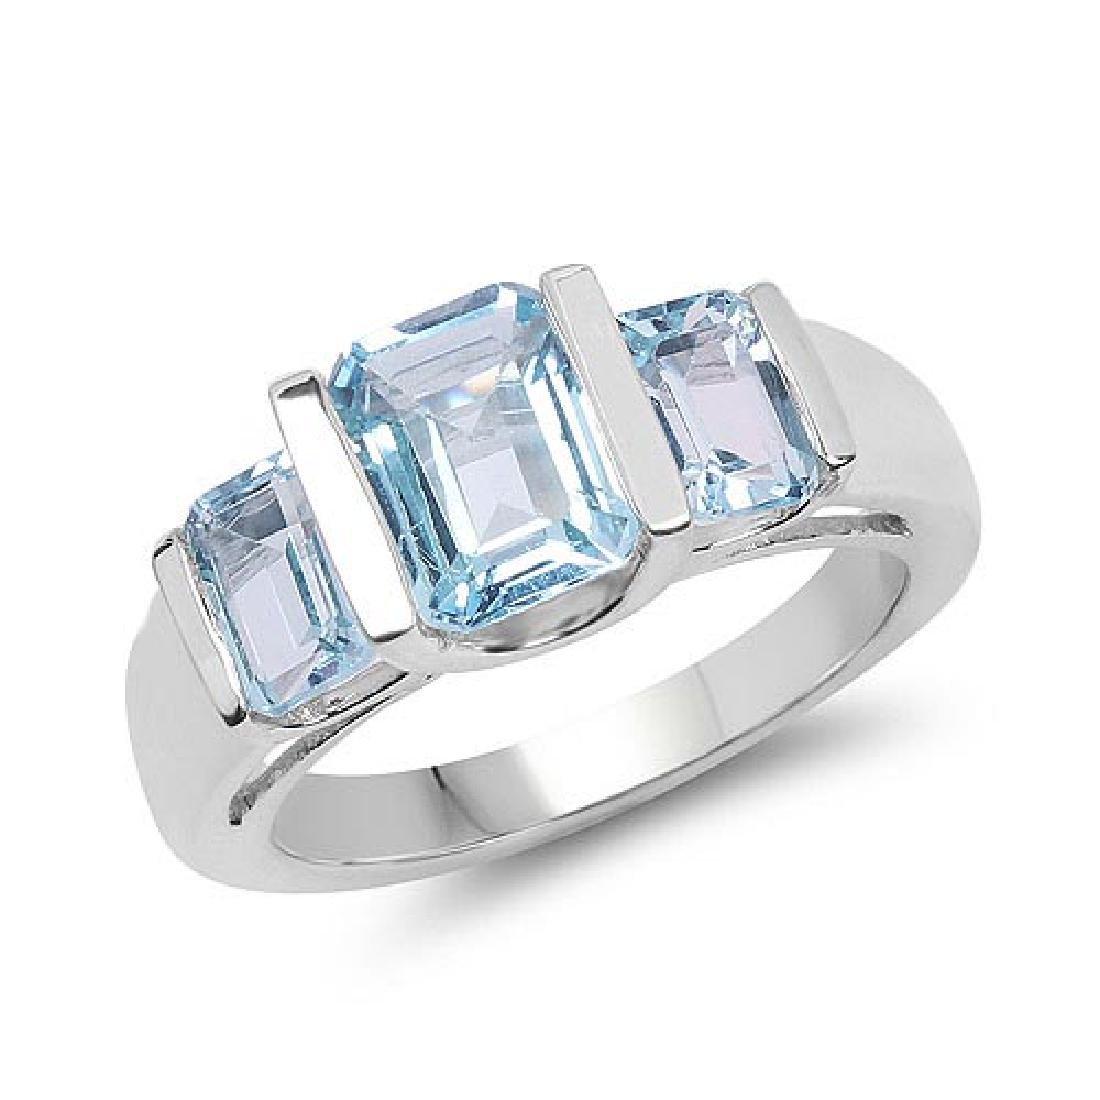 3.21 Carat Genuine Blue Topaz .925 Sterling Silver Ring